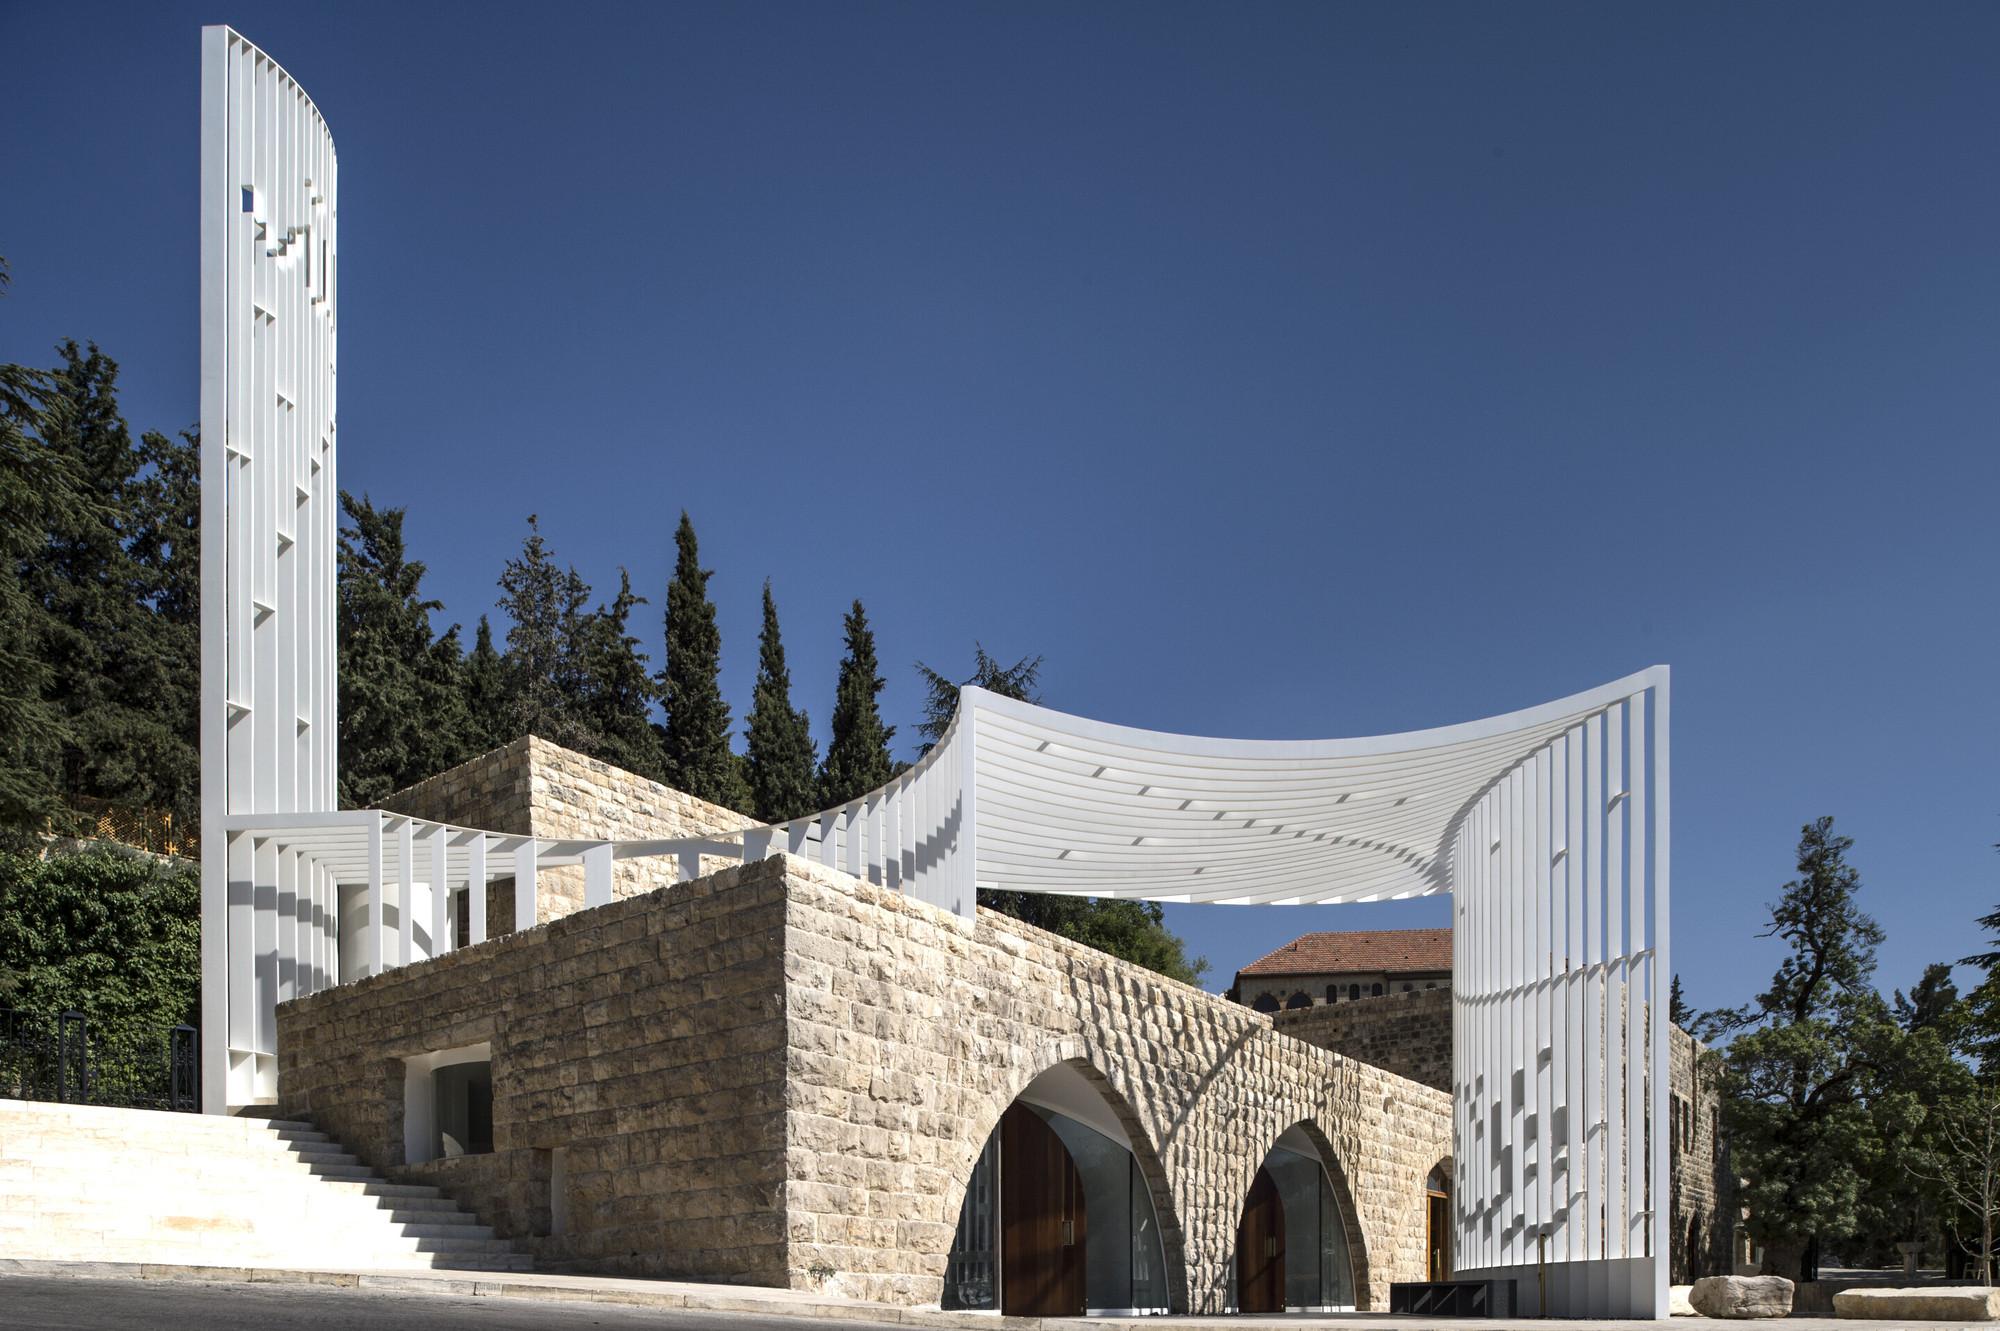 Faith U0026 Formu0027s 2017 Religious Architecture Awards Recognizes The Best In  Religious Architecture And Art, Pictures